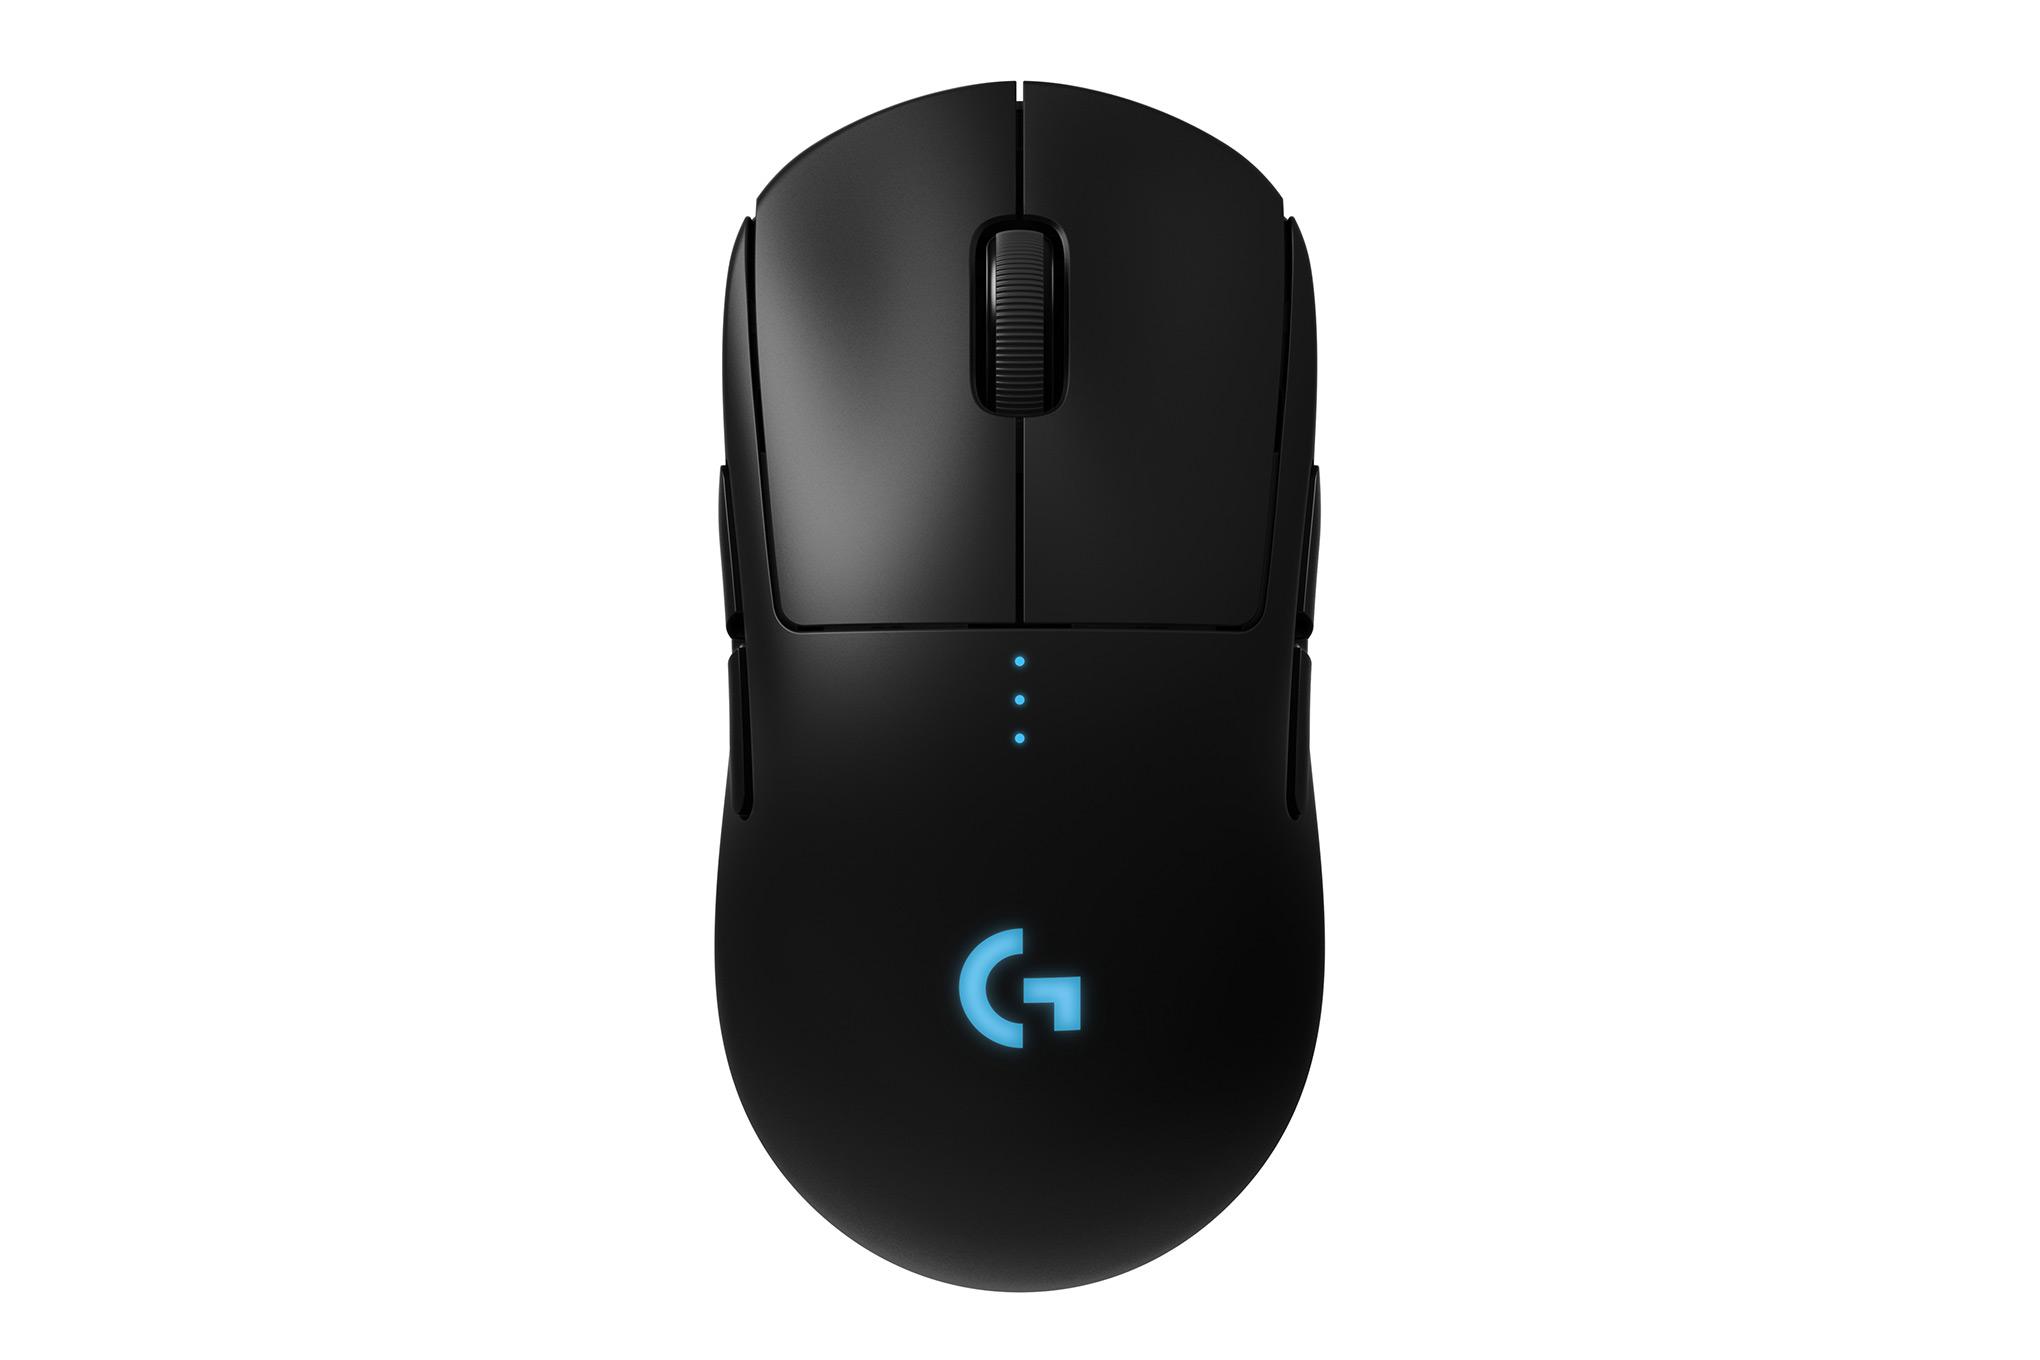 Logitech's Pro Wireless mouse is already an Overwatch League